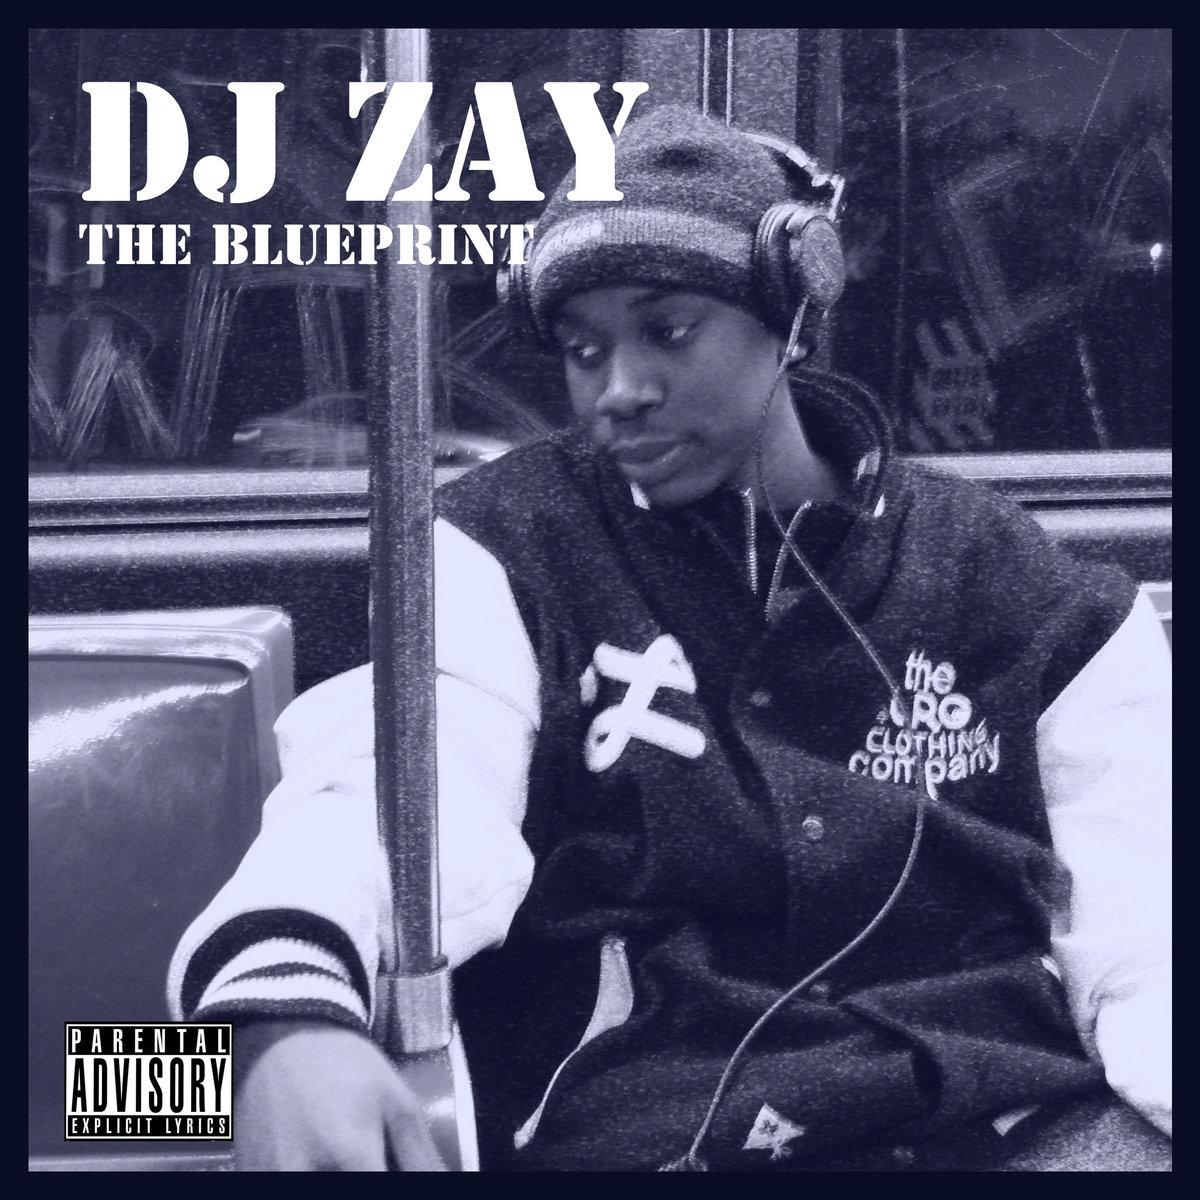 Heart of the city aint no love dj zay remix dj zay from the blueprint a fair alternative by dj zay malvernweather Images